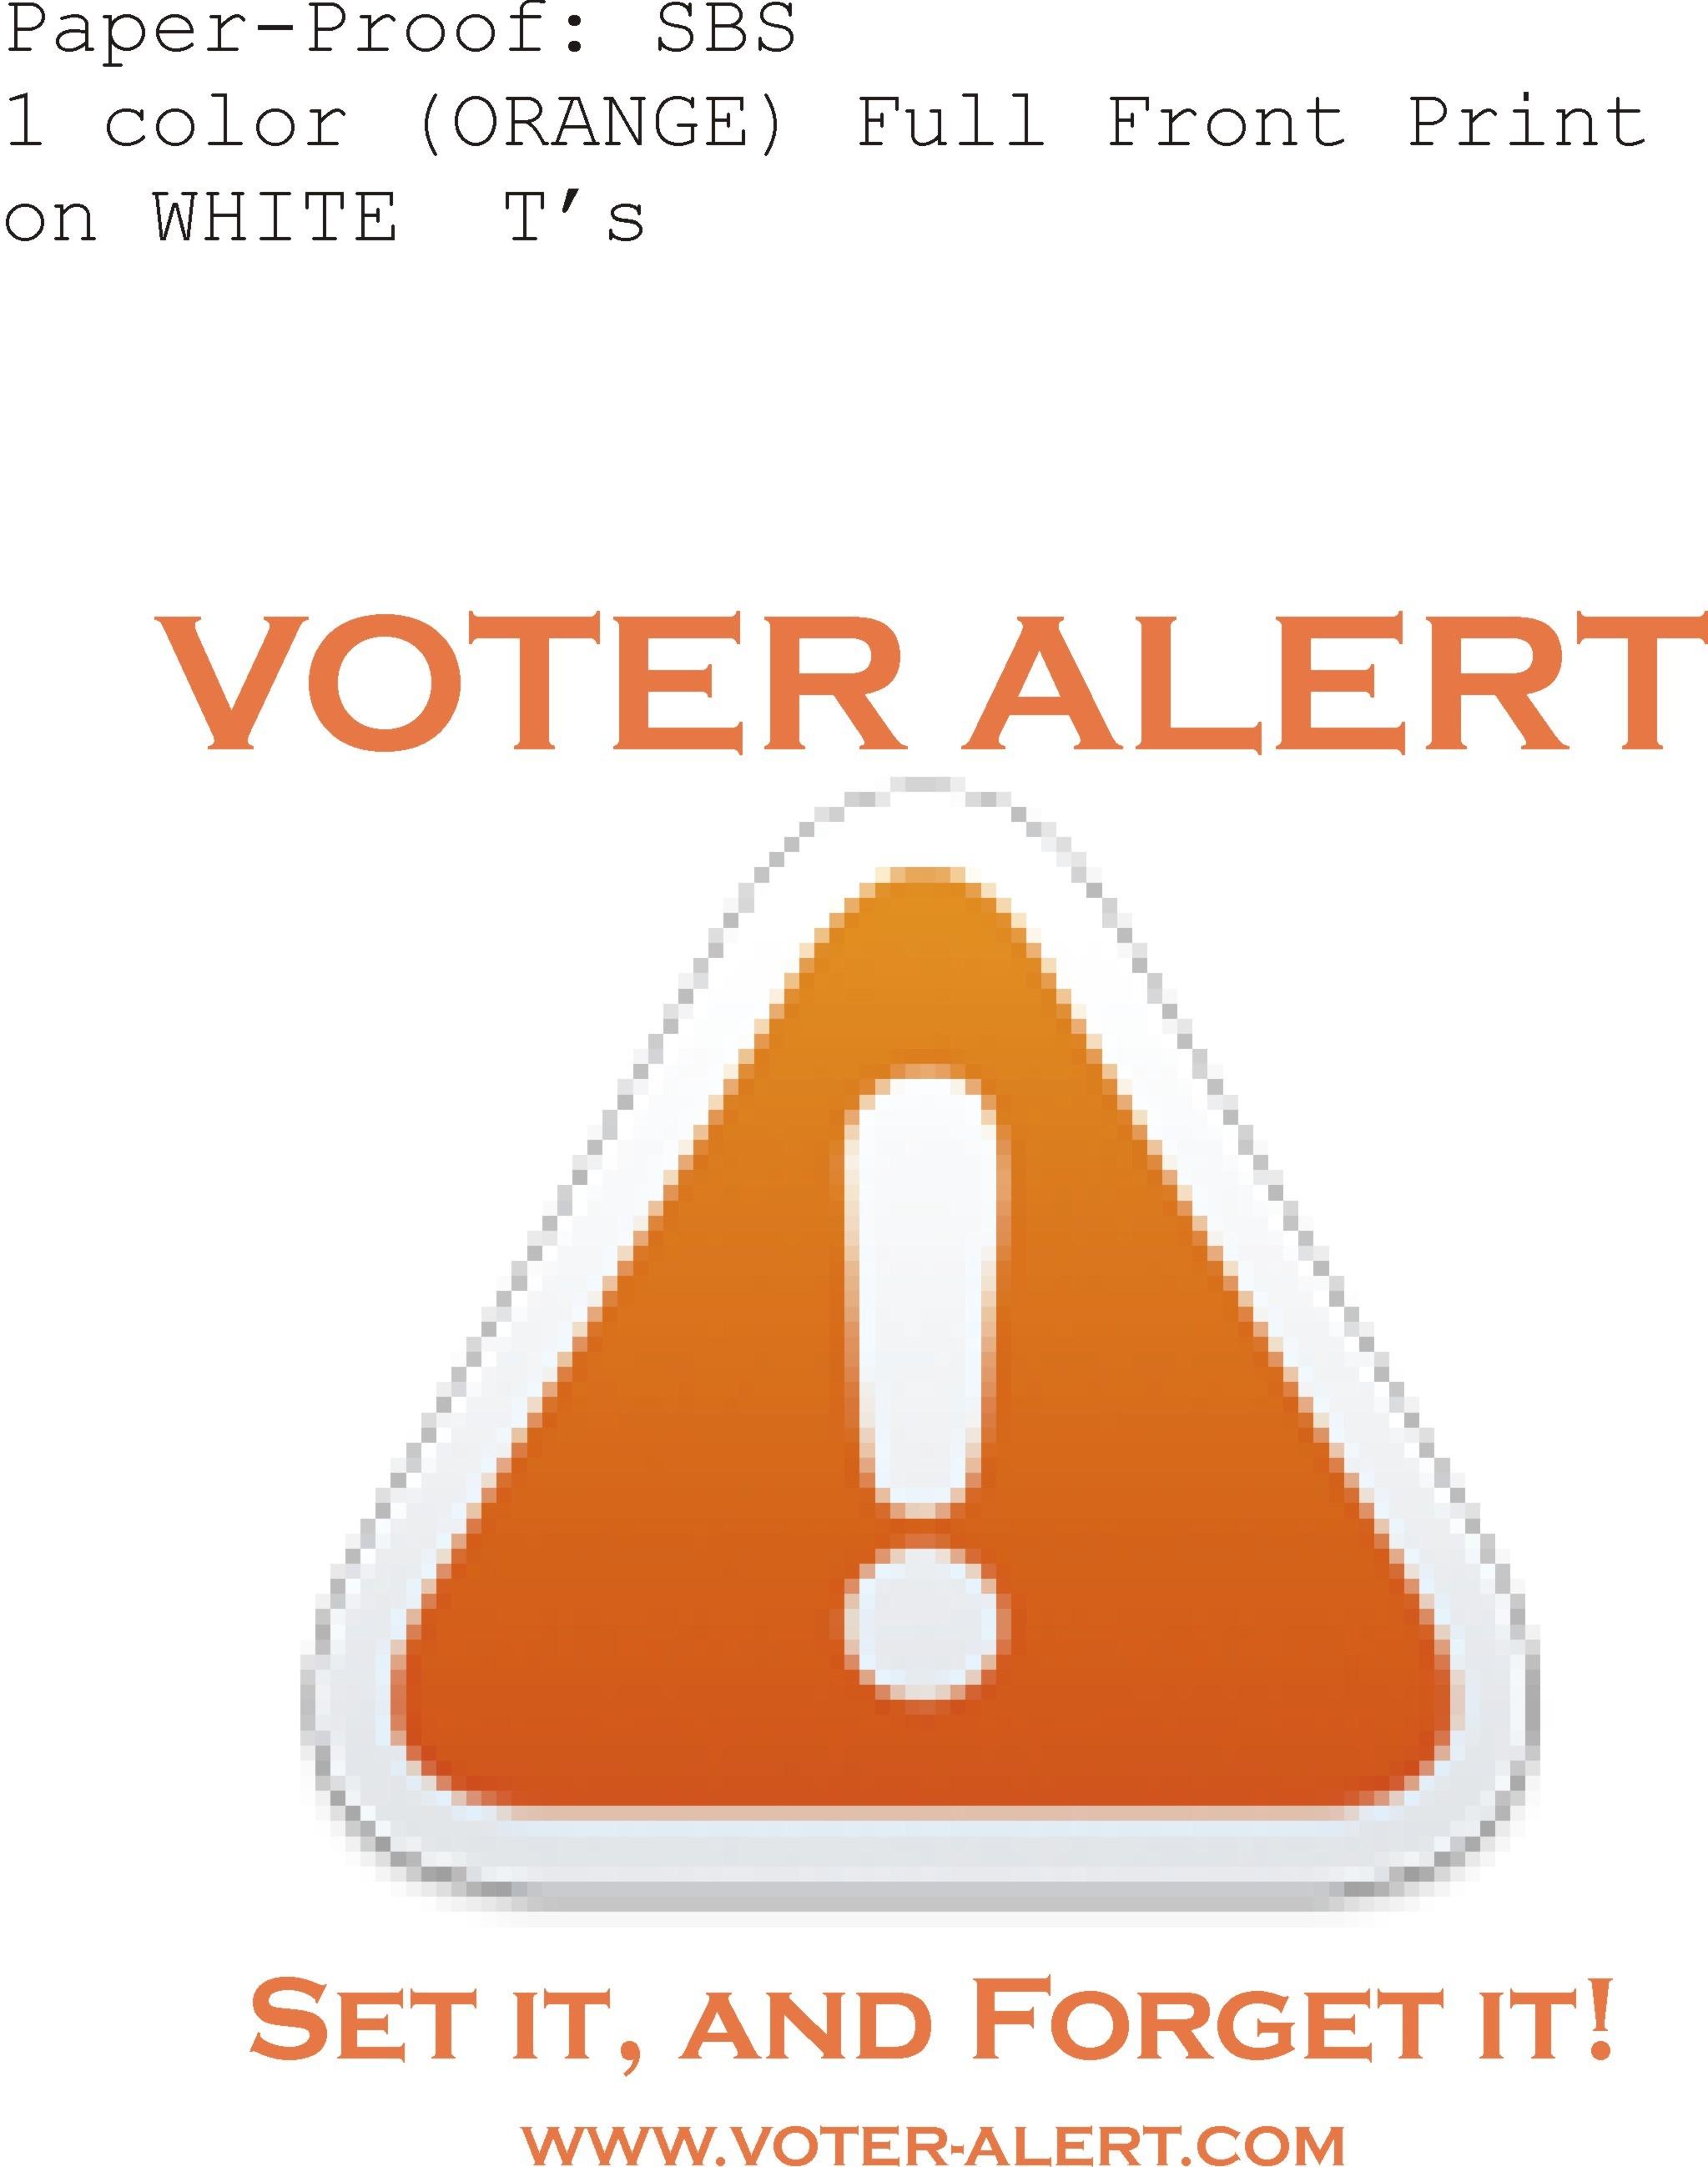 e9e1b1a47606e32d80ad_voter-alert_FF_PP.jpg